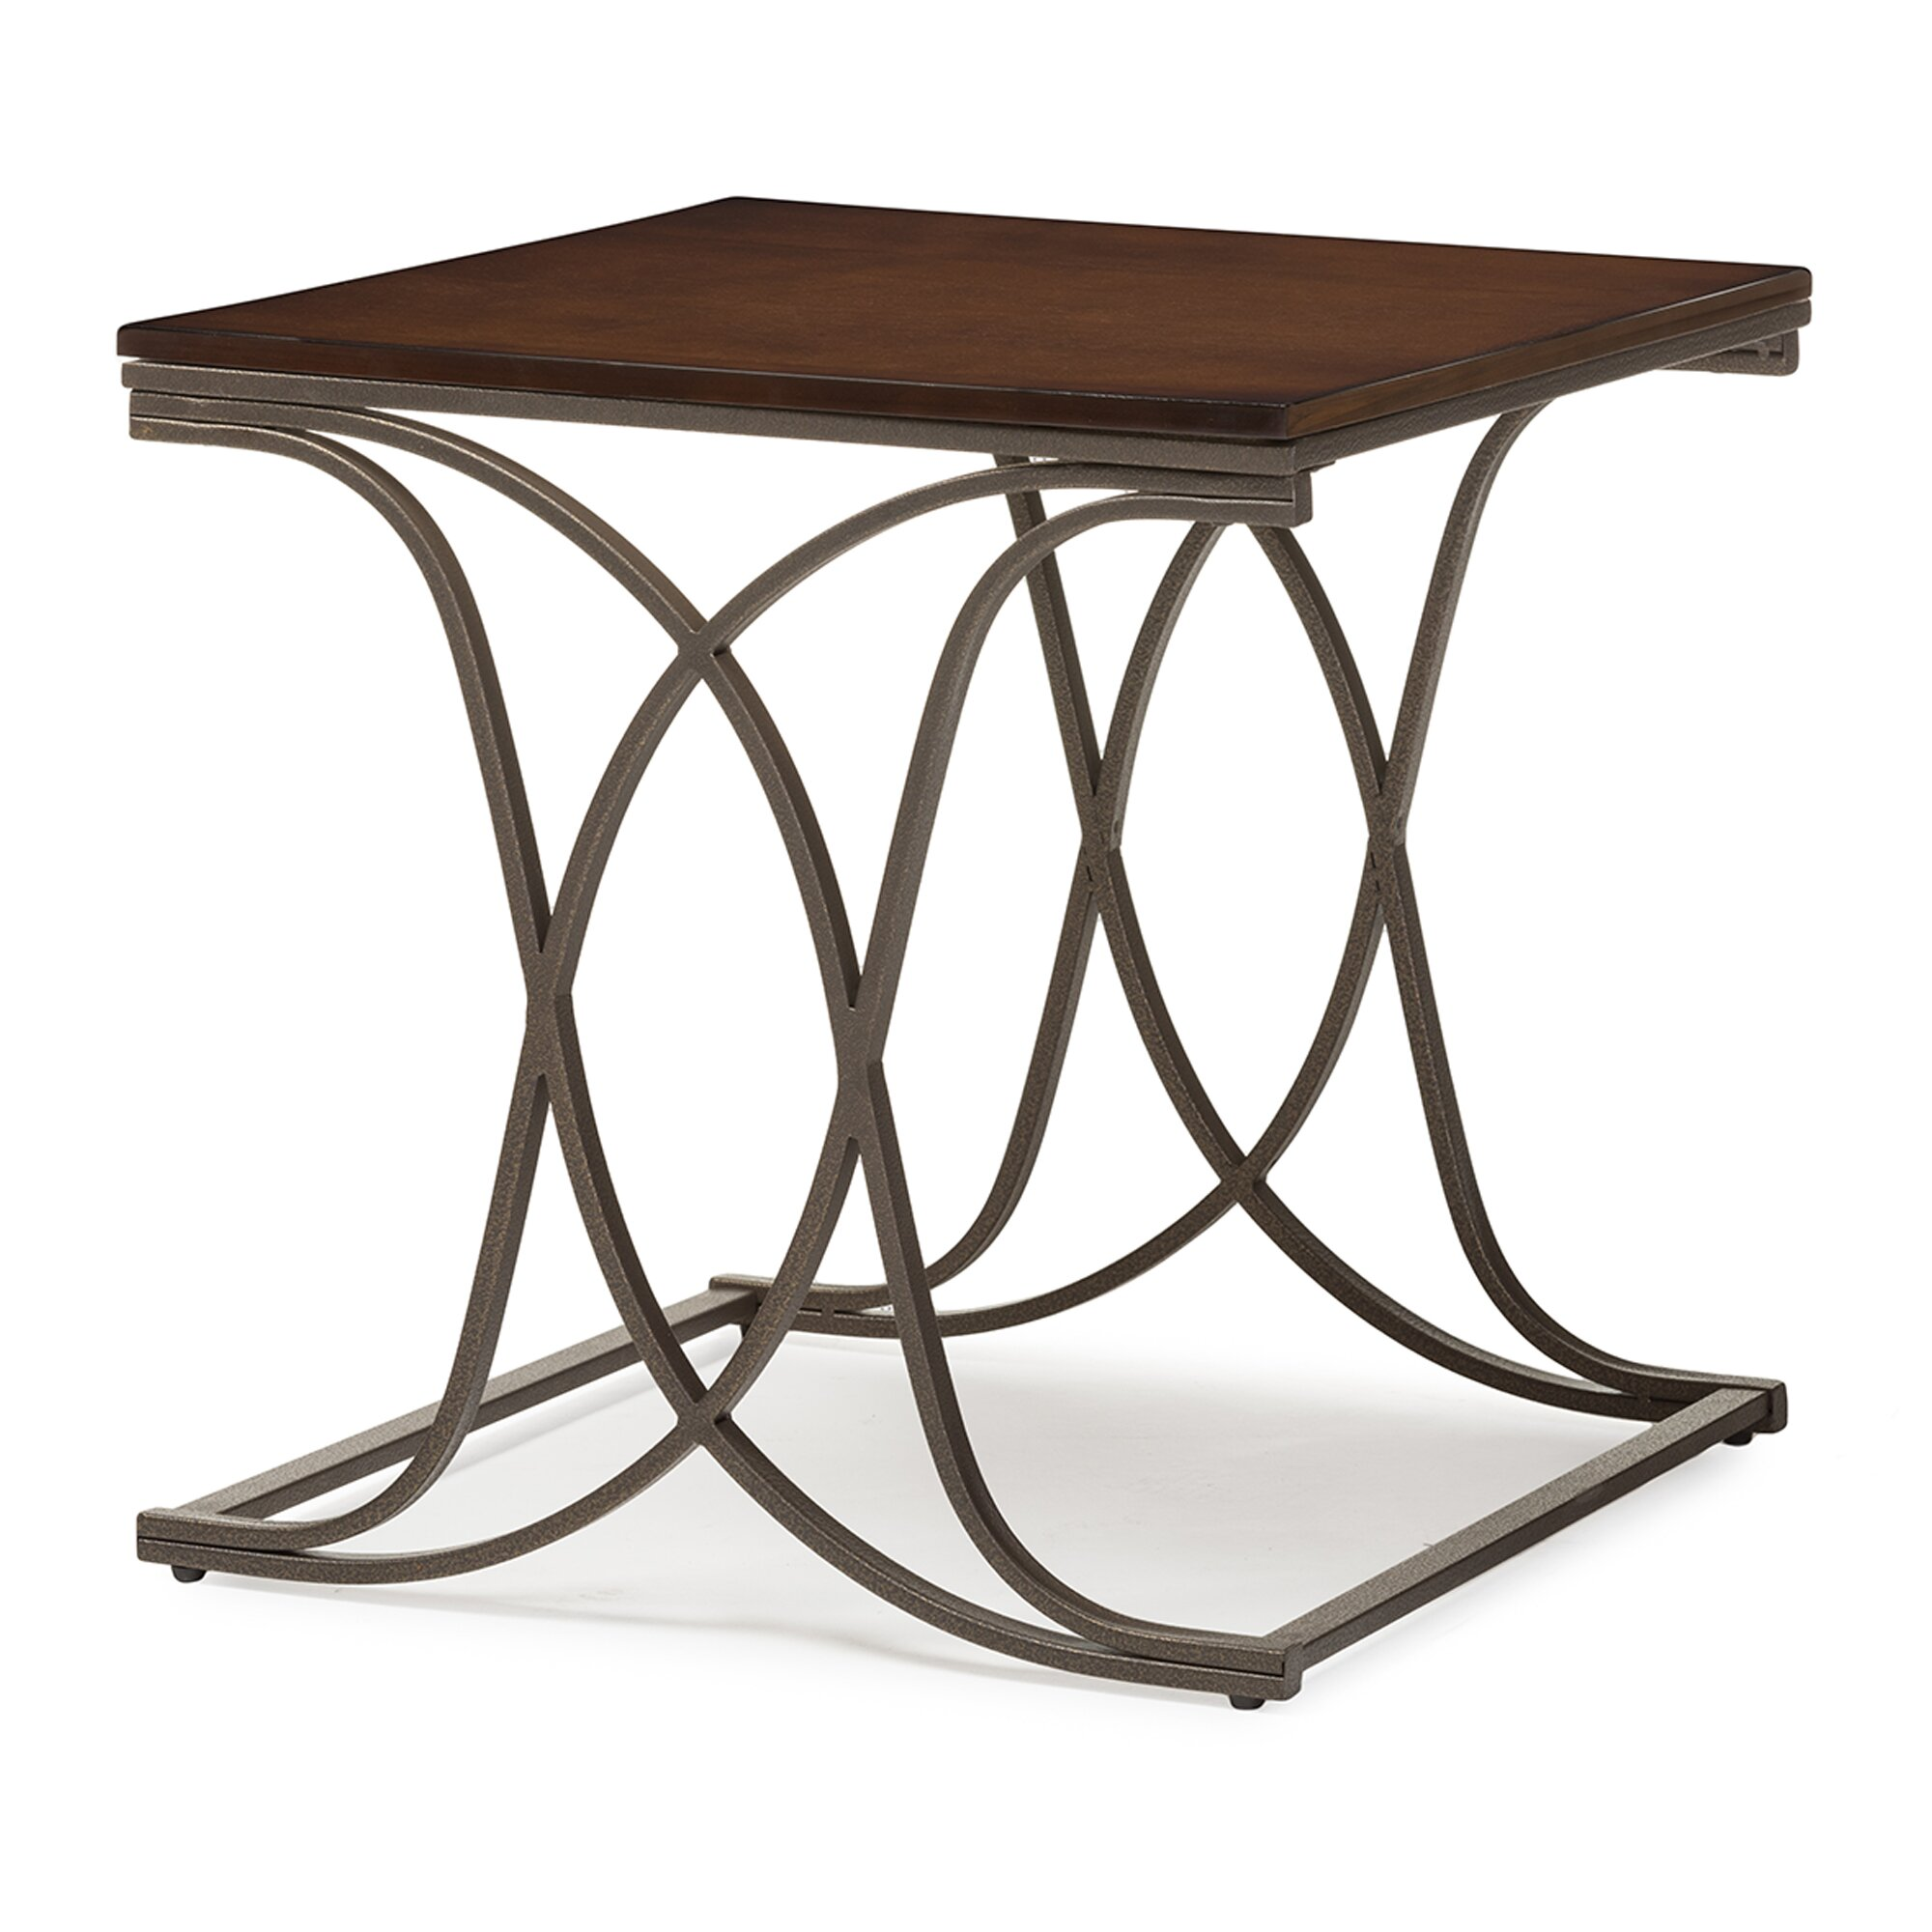 Antique occasional chair - Wholesale Interiors Baxton Studio Terrance 3 Piece Coffee Table Set